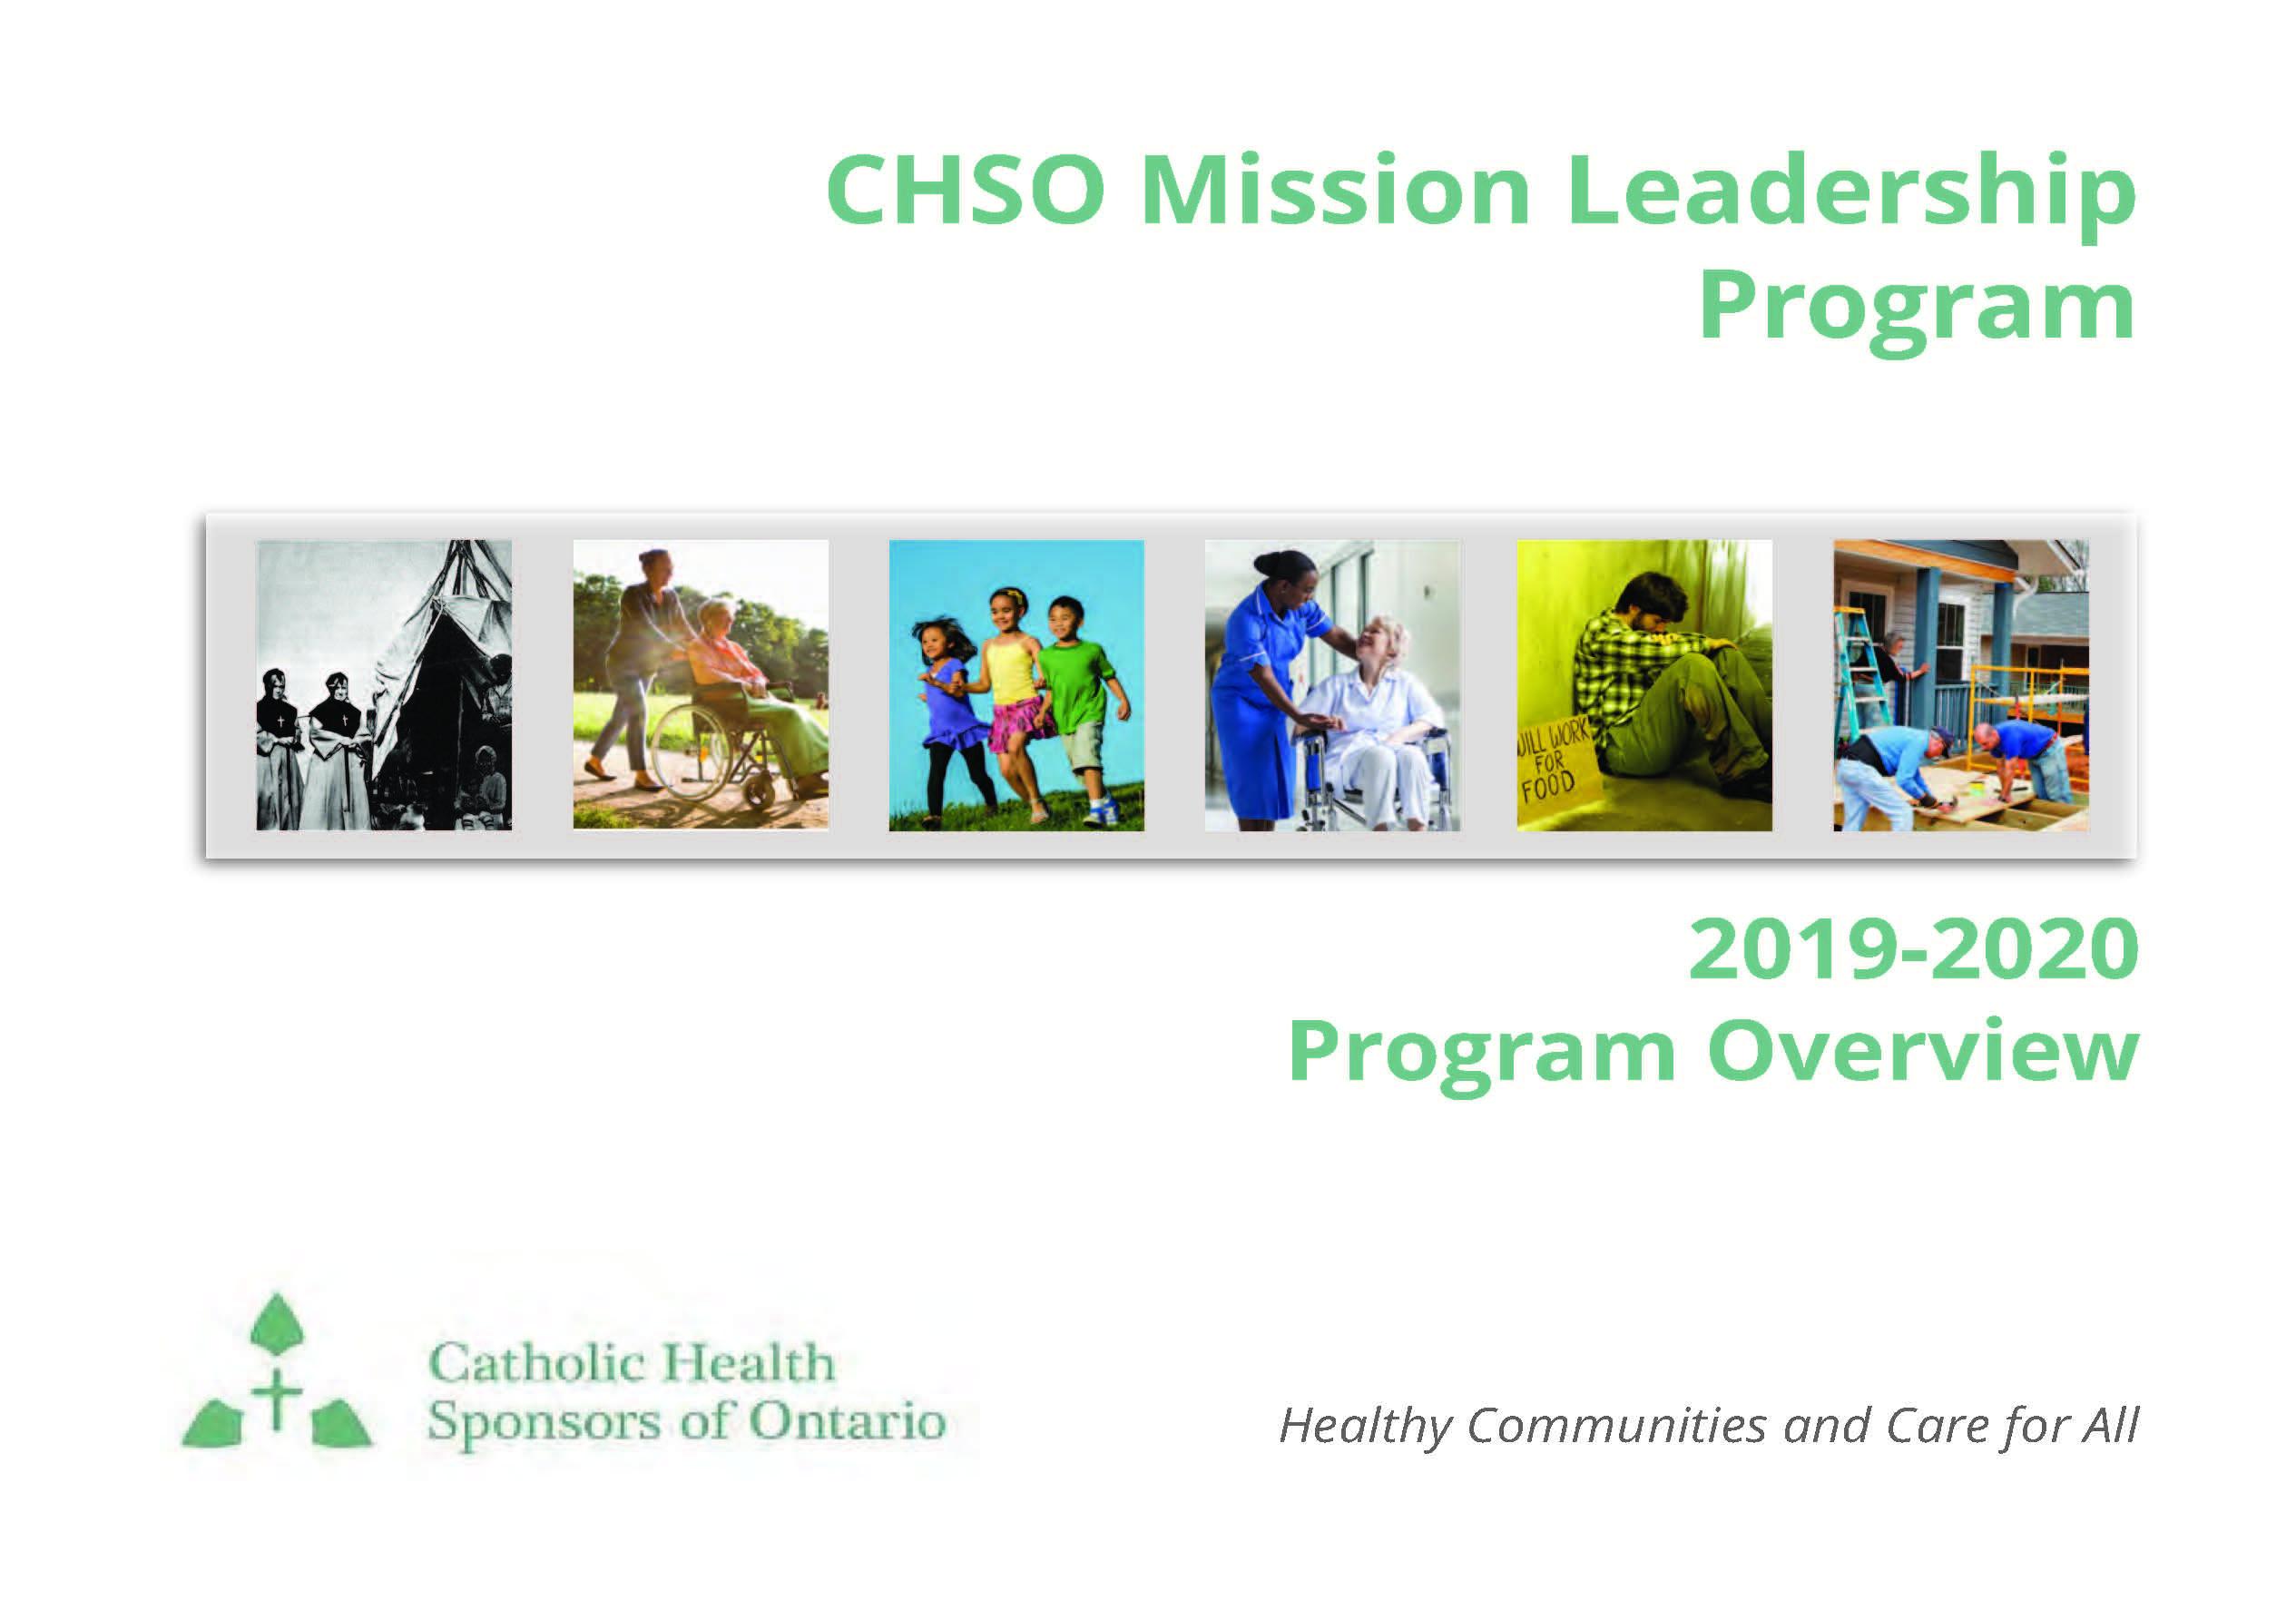 CHSO Mission Leadership Program